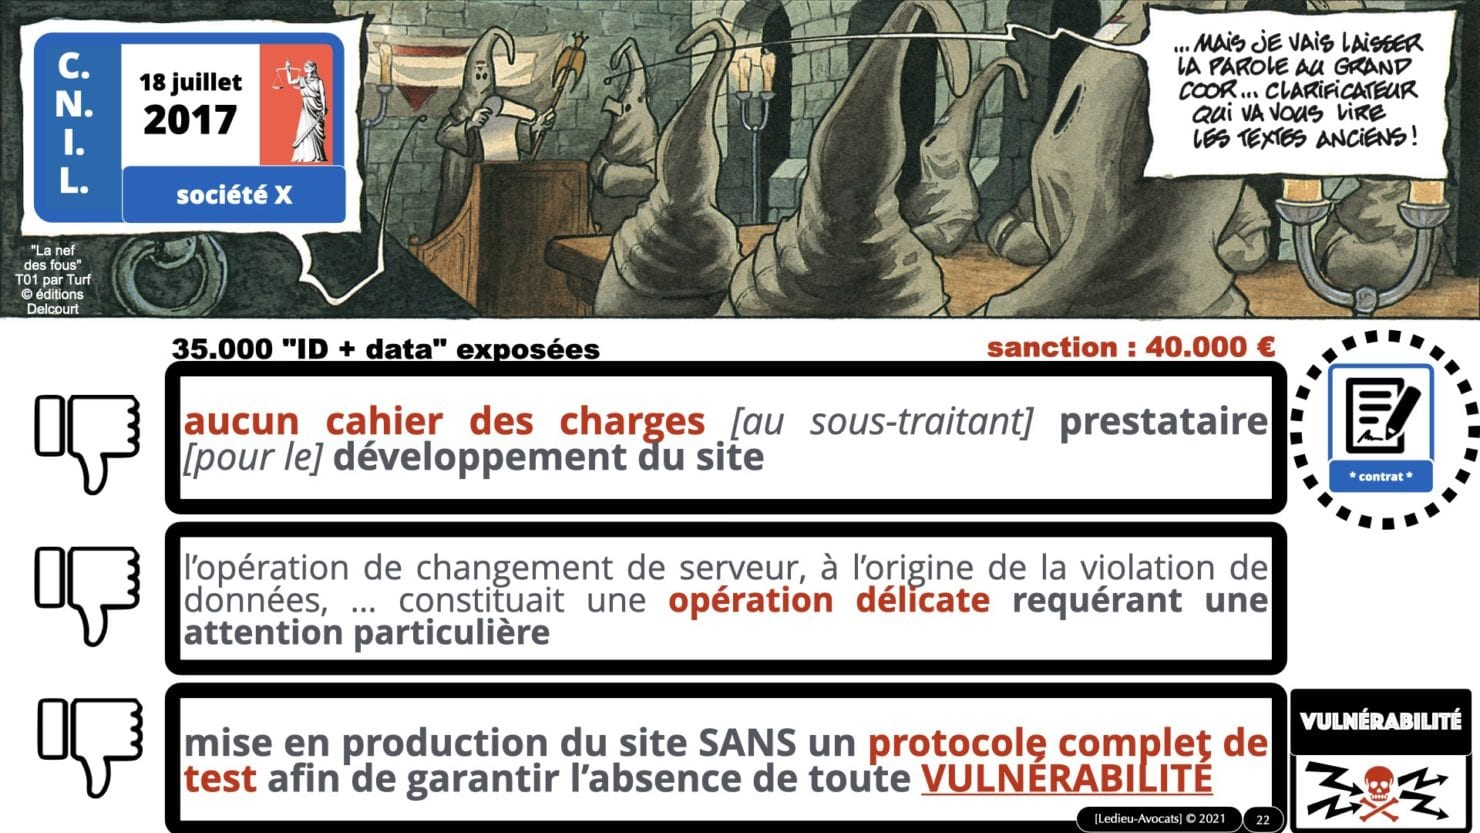 RGPD e-Privacy principes actualité jurisprudence ©Ledieu-Avocats 25-06-2021.022